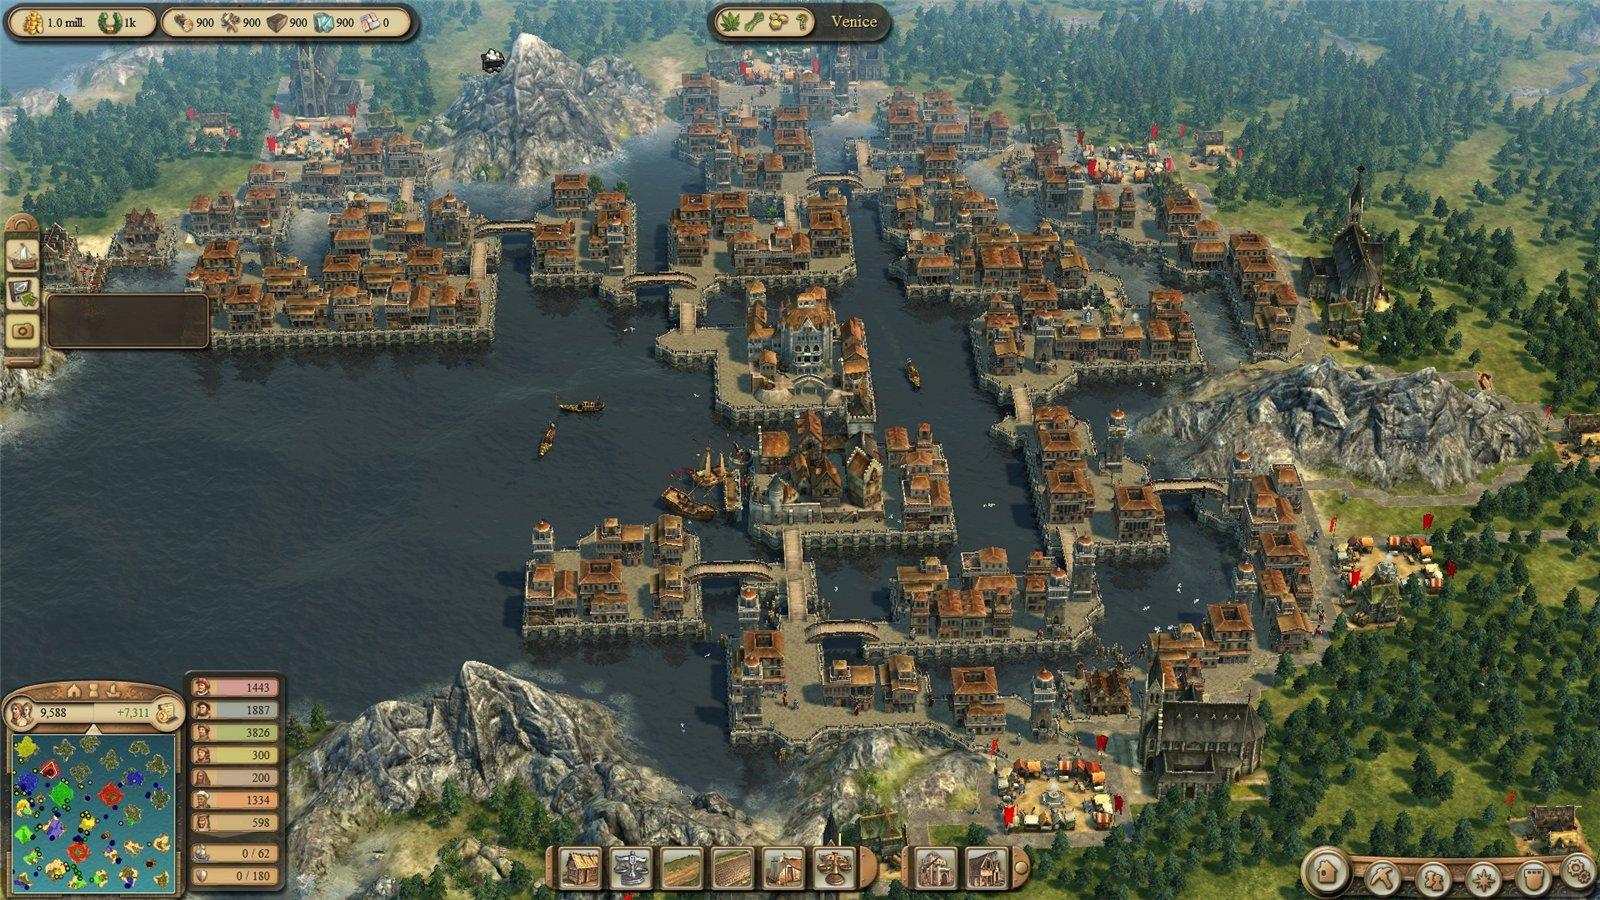 House Building Games Online Anno 1404 Venice Venice Anno 1404